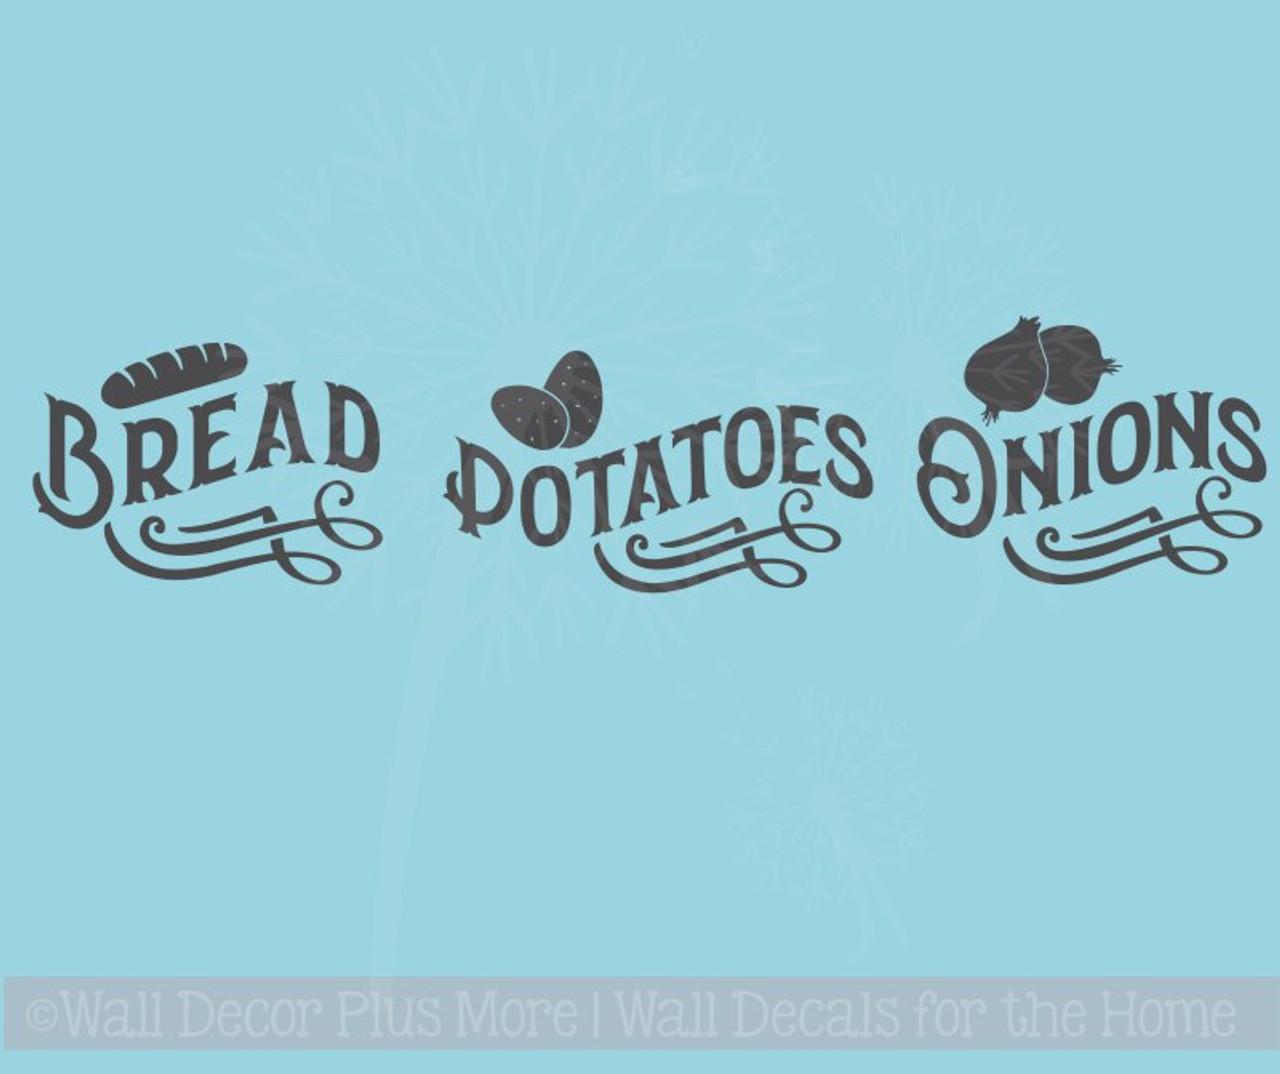 Bread Potatoes Onions Vinyl Stickers Label Kitchen Storage